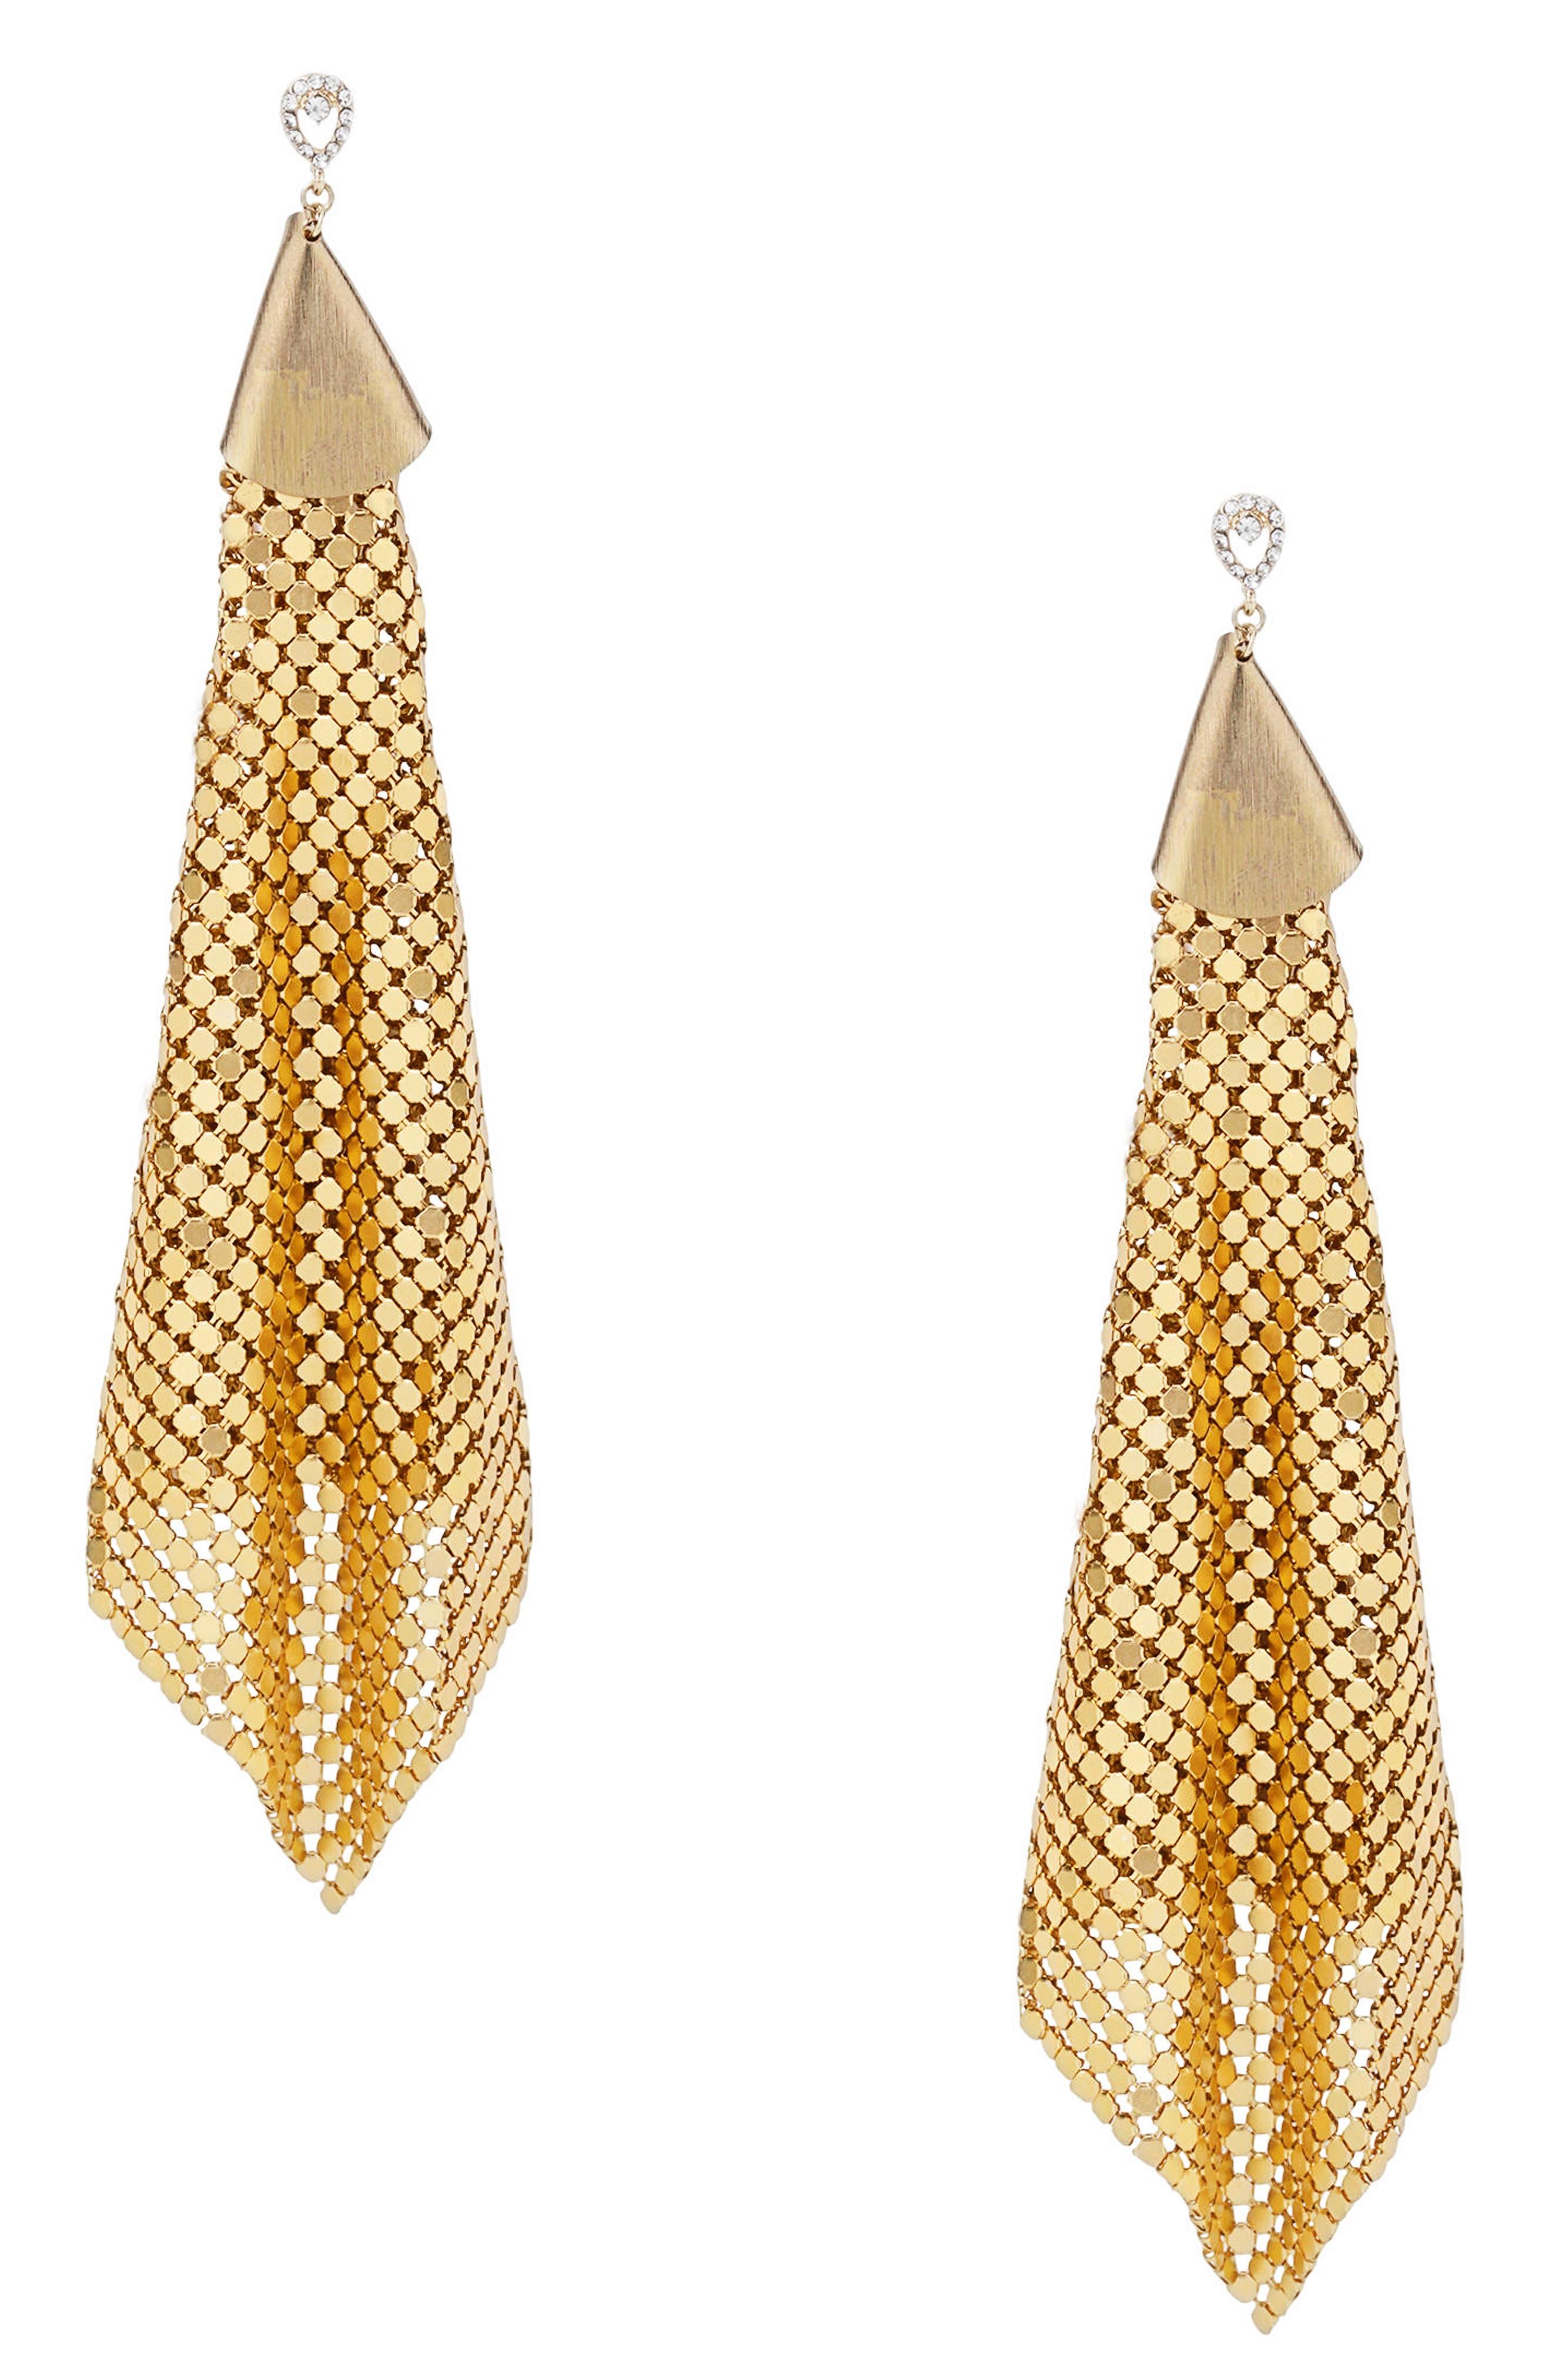 Mesh Chain Statement Earrings,                             Main thumbnail 1, color,                             710